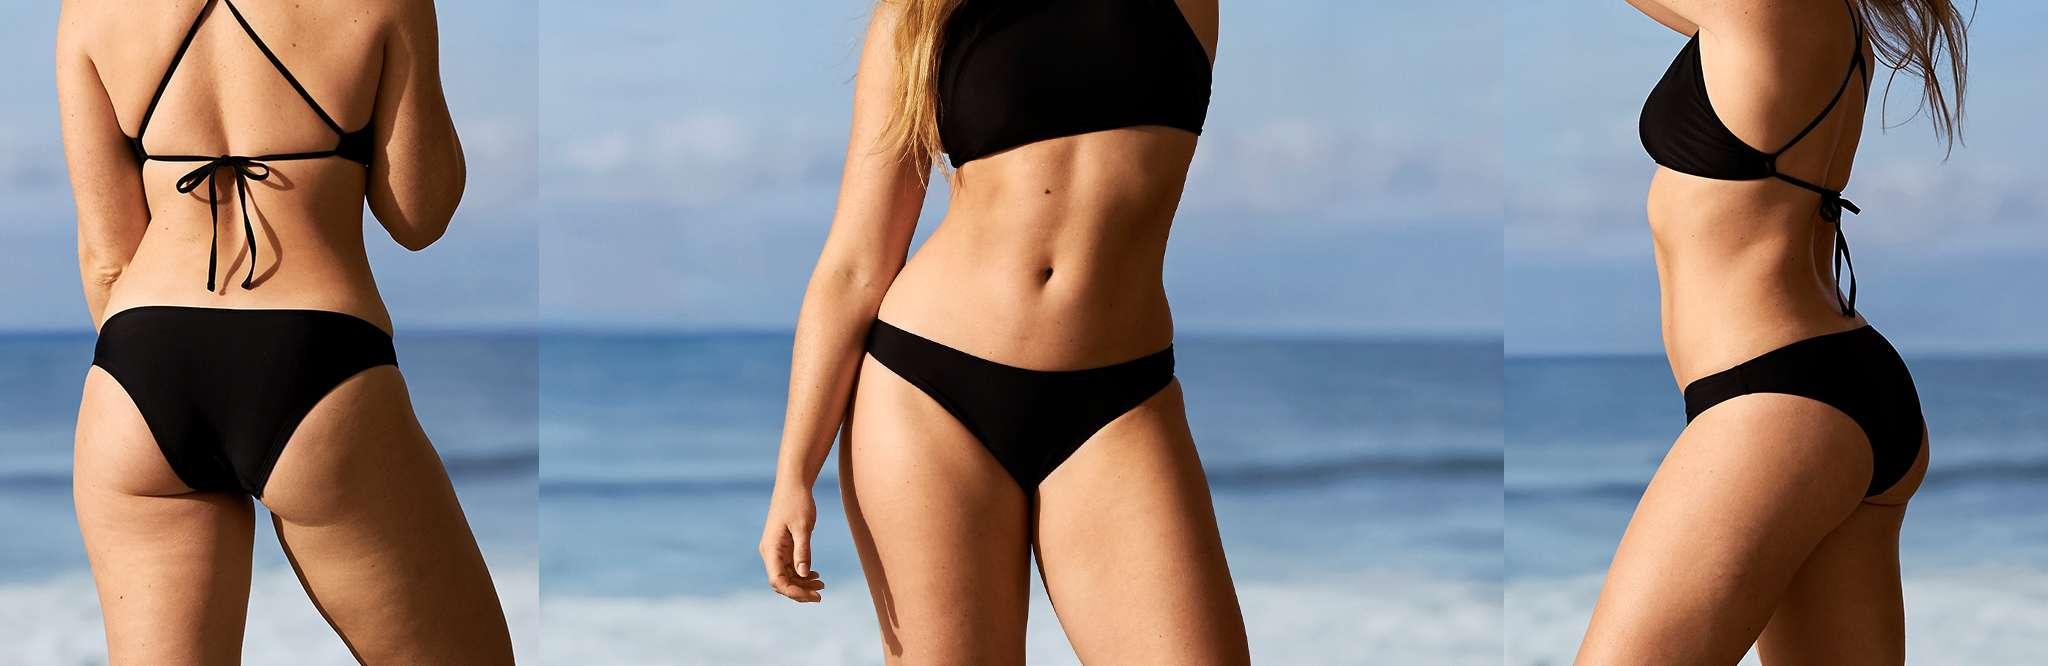 Bikini bottom com, tracey cole nude